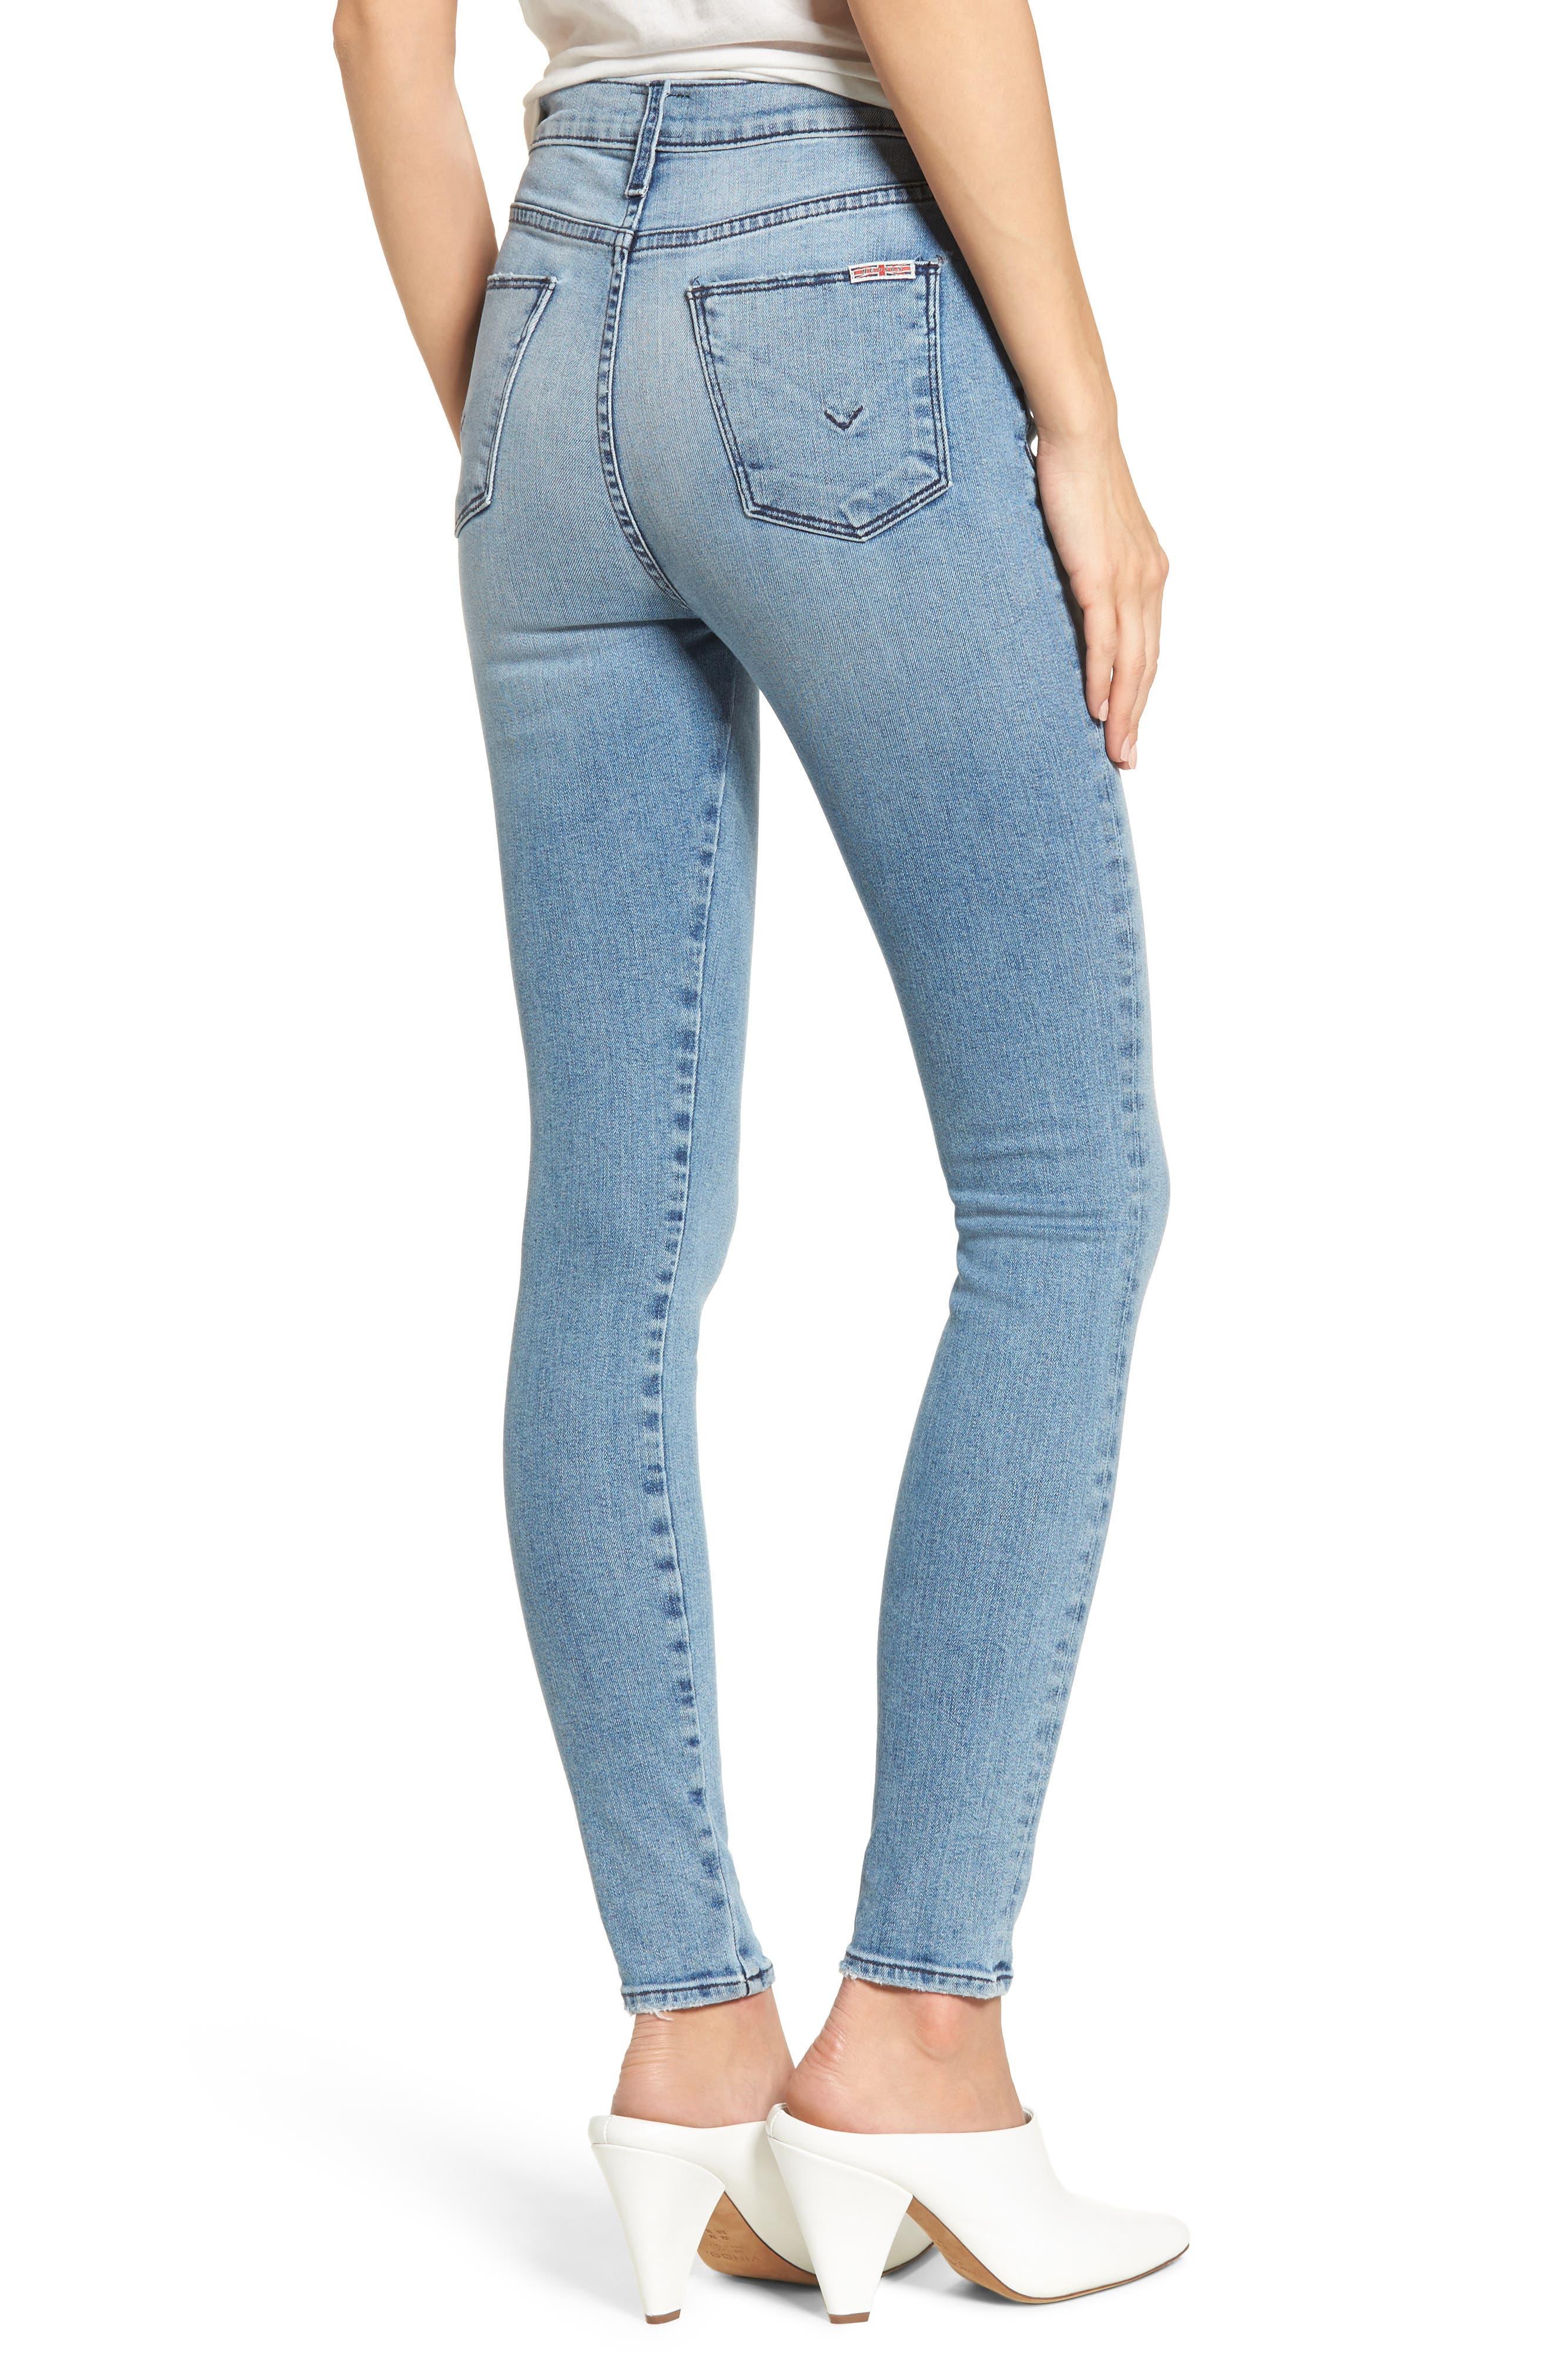 Bullocks Lace-Up High Waist Super Skinny Jeans,                             Alternate thumbnail 4, color,